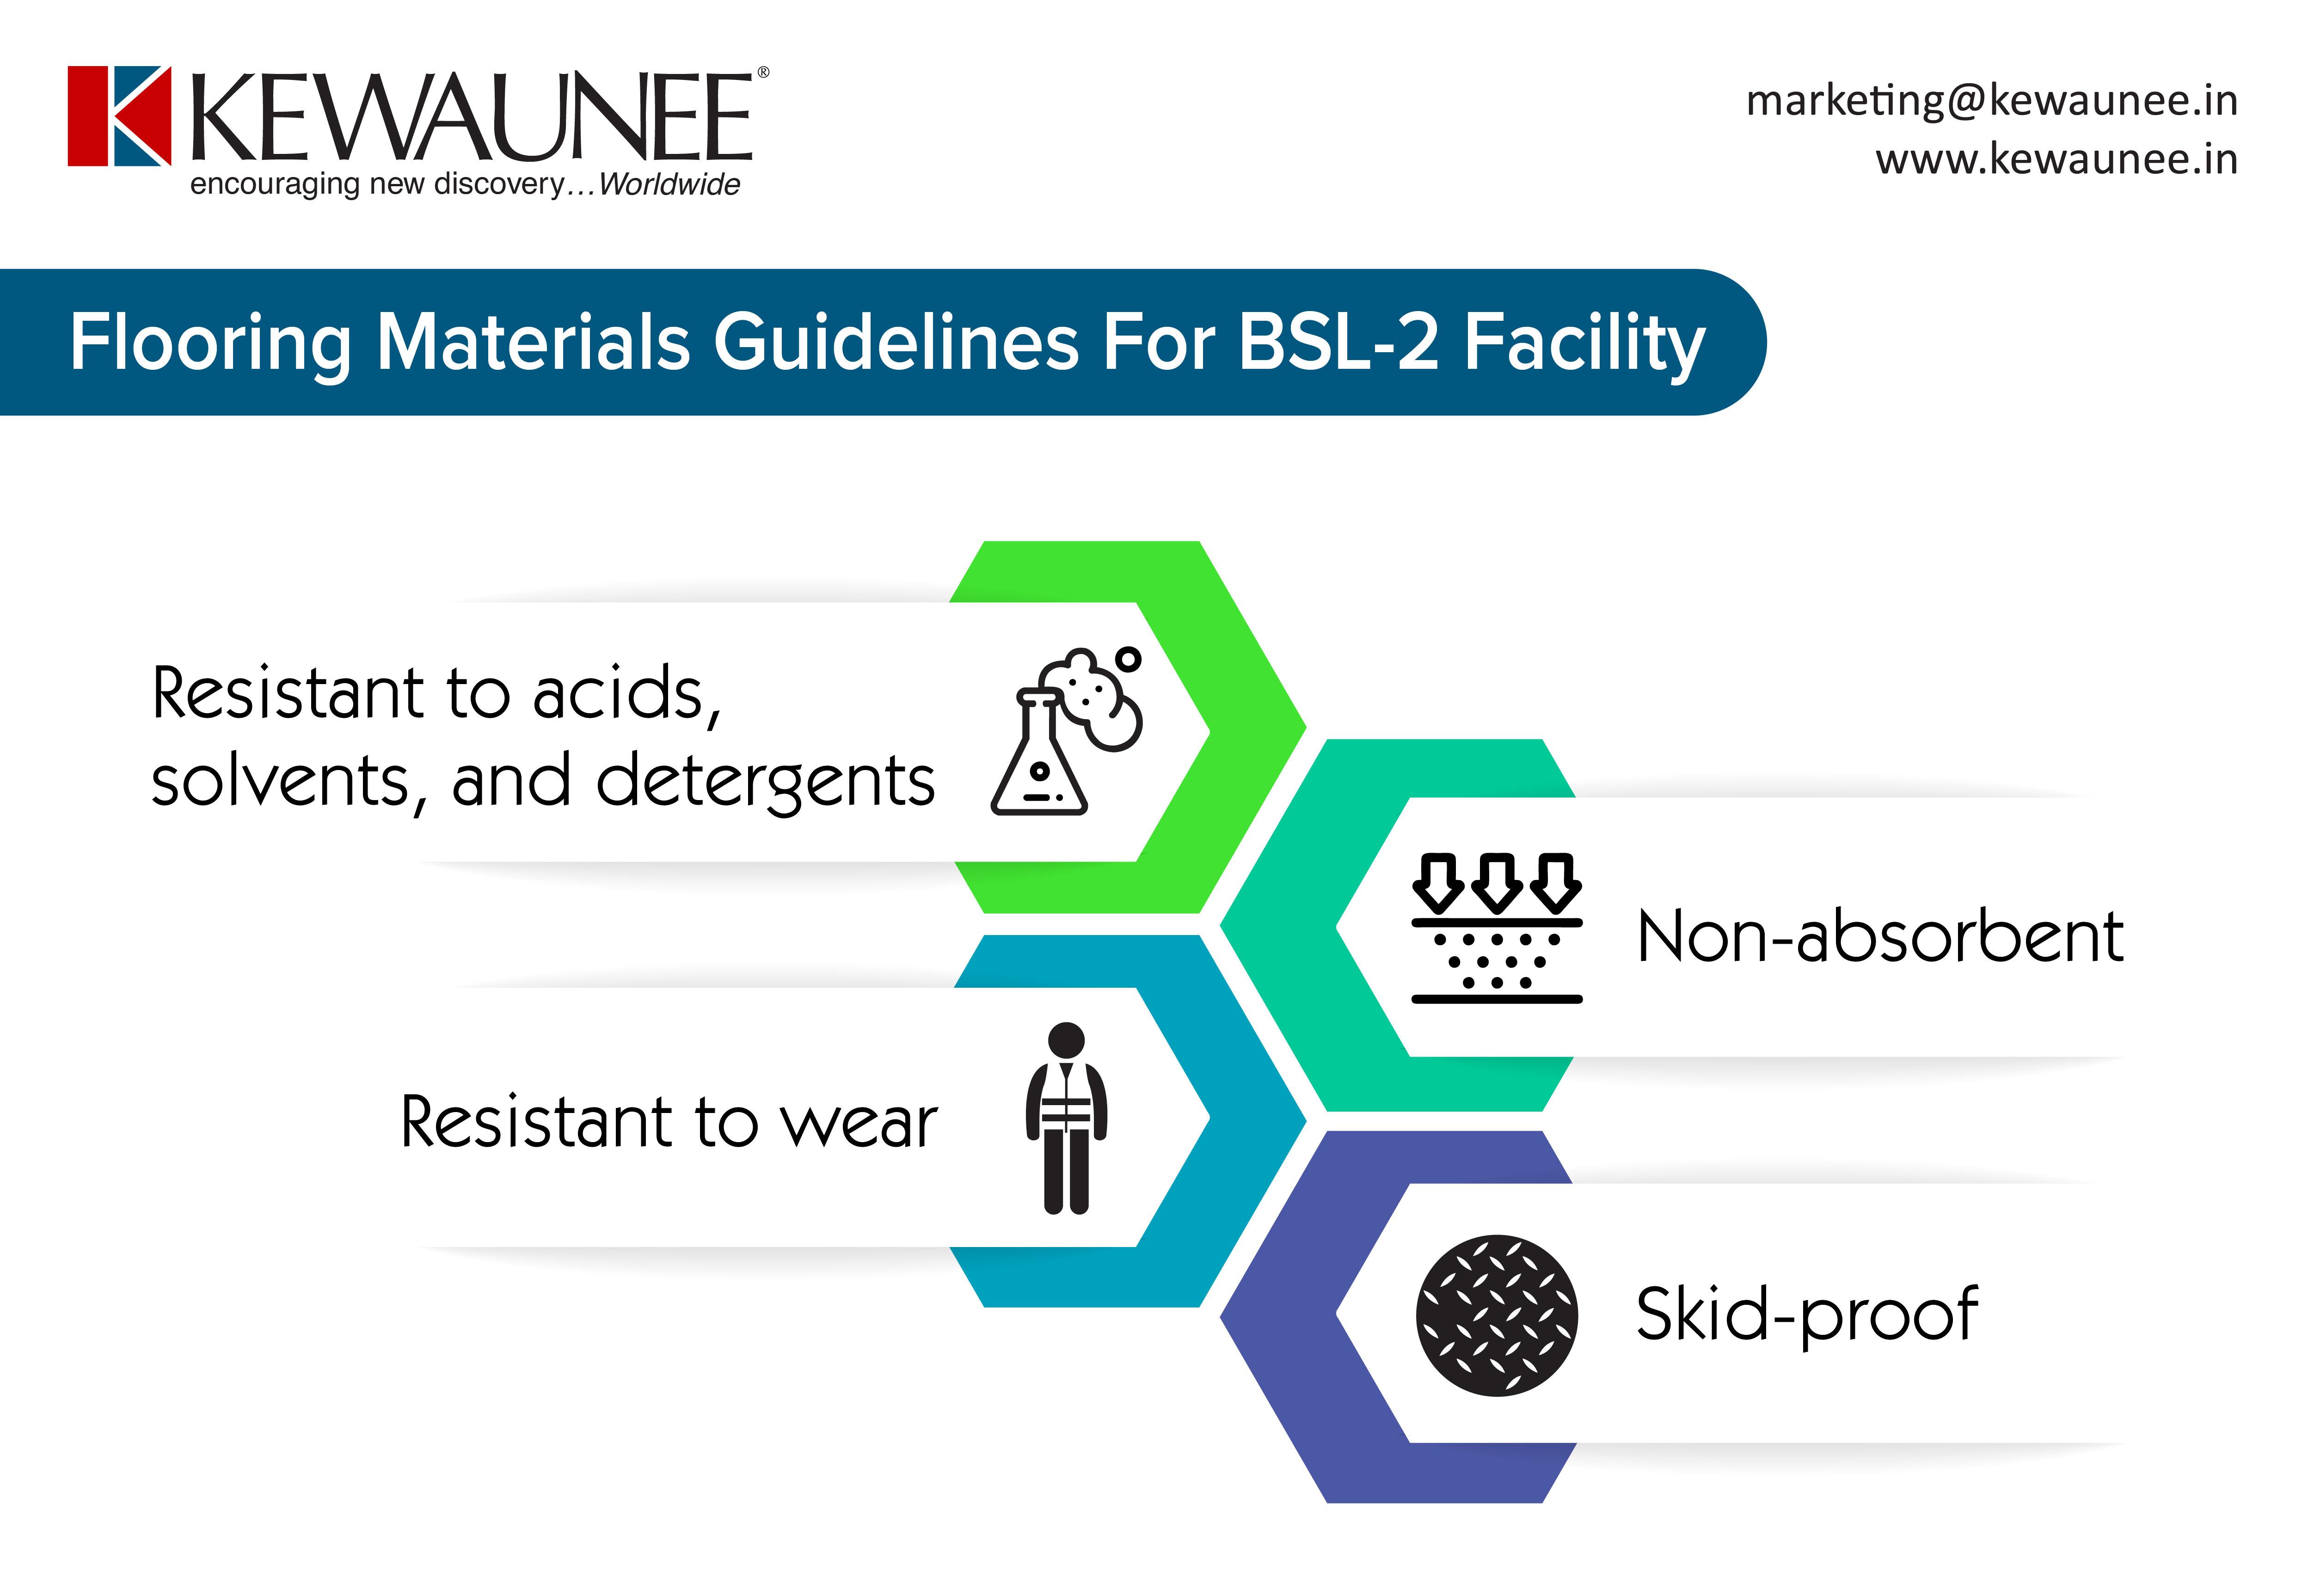 Flooring Materials Guidelines